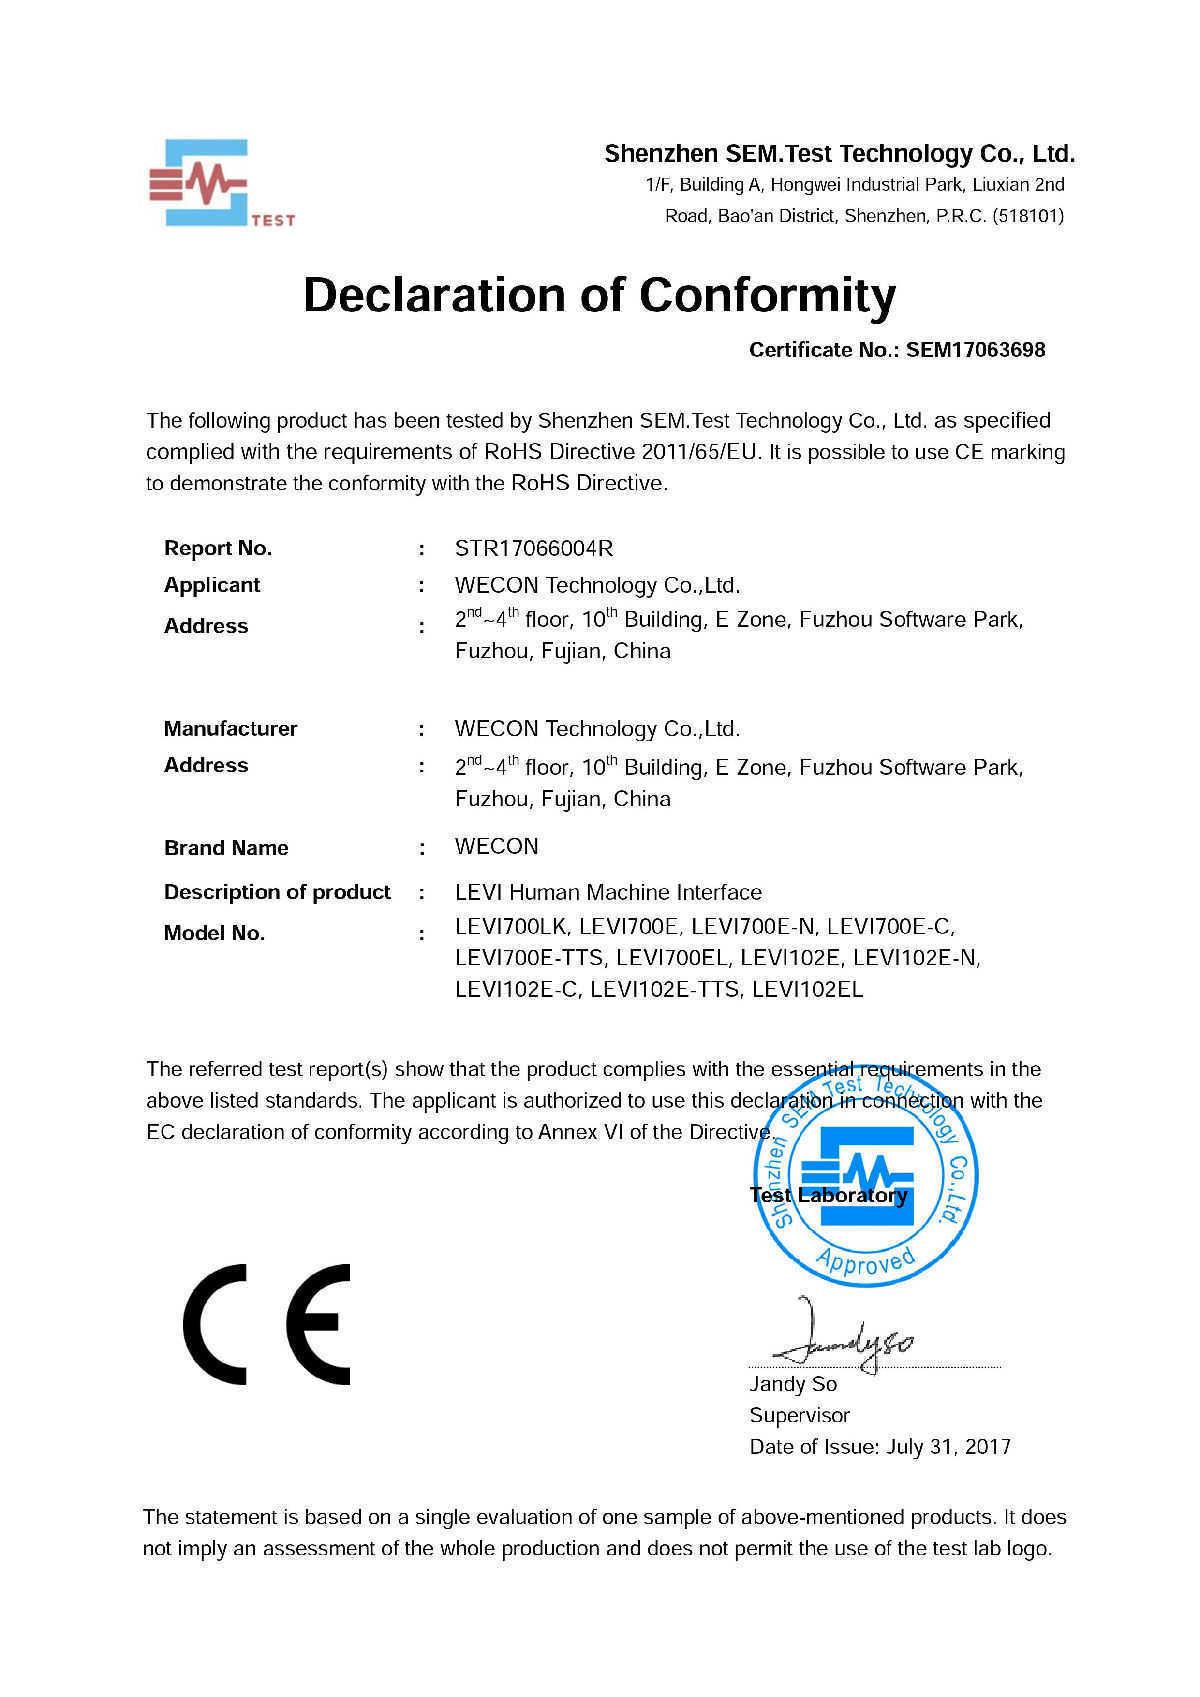 сертификат RoHS выдан